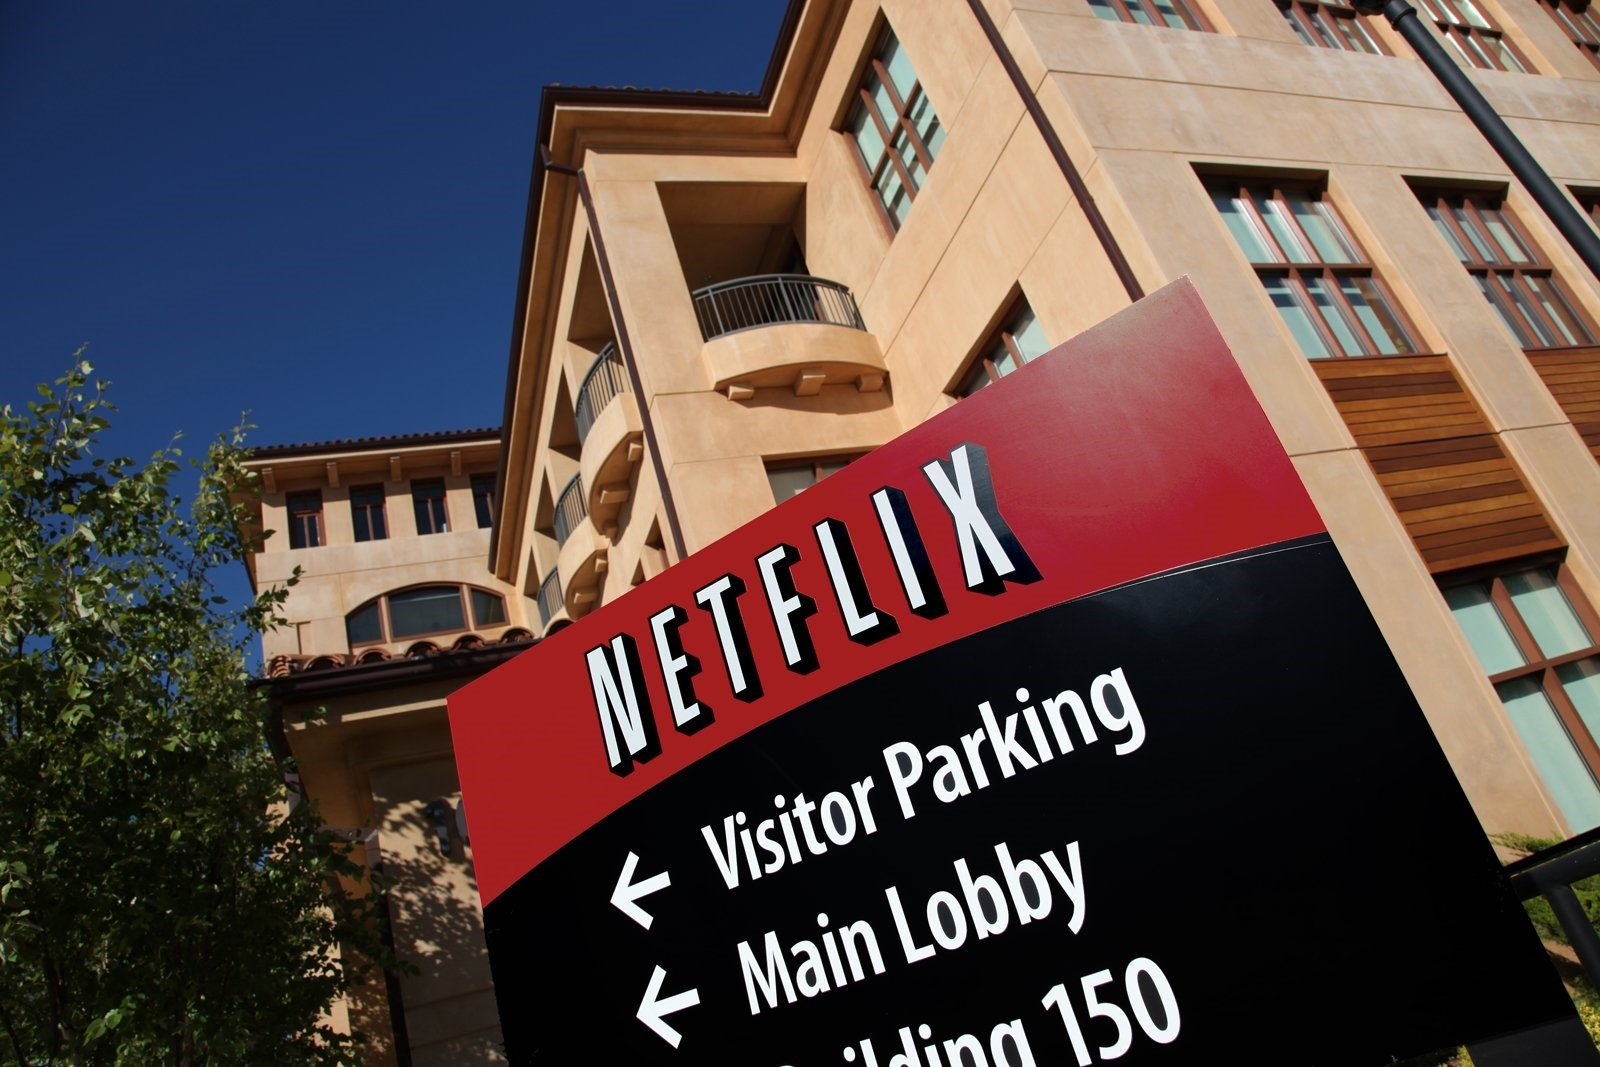 Hackers Leak Popular Netflix Series; Claims Fox, ABC Shows Next — FBI Investigation